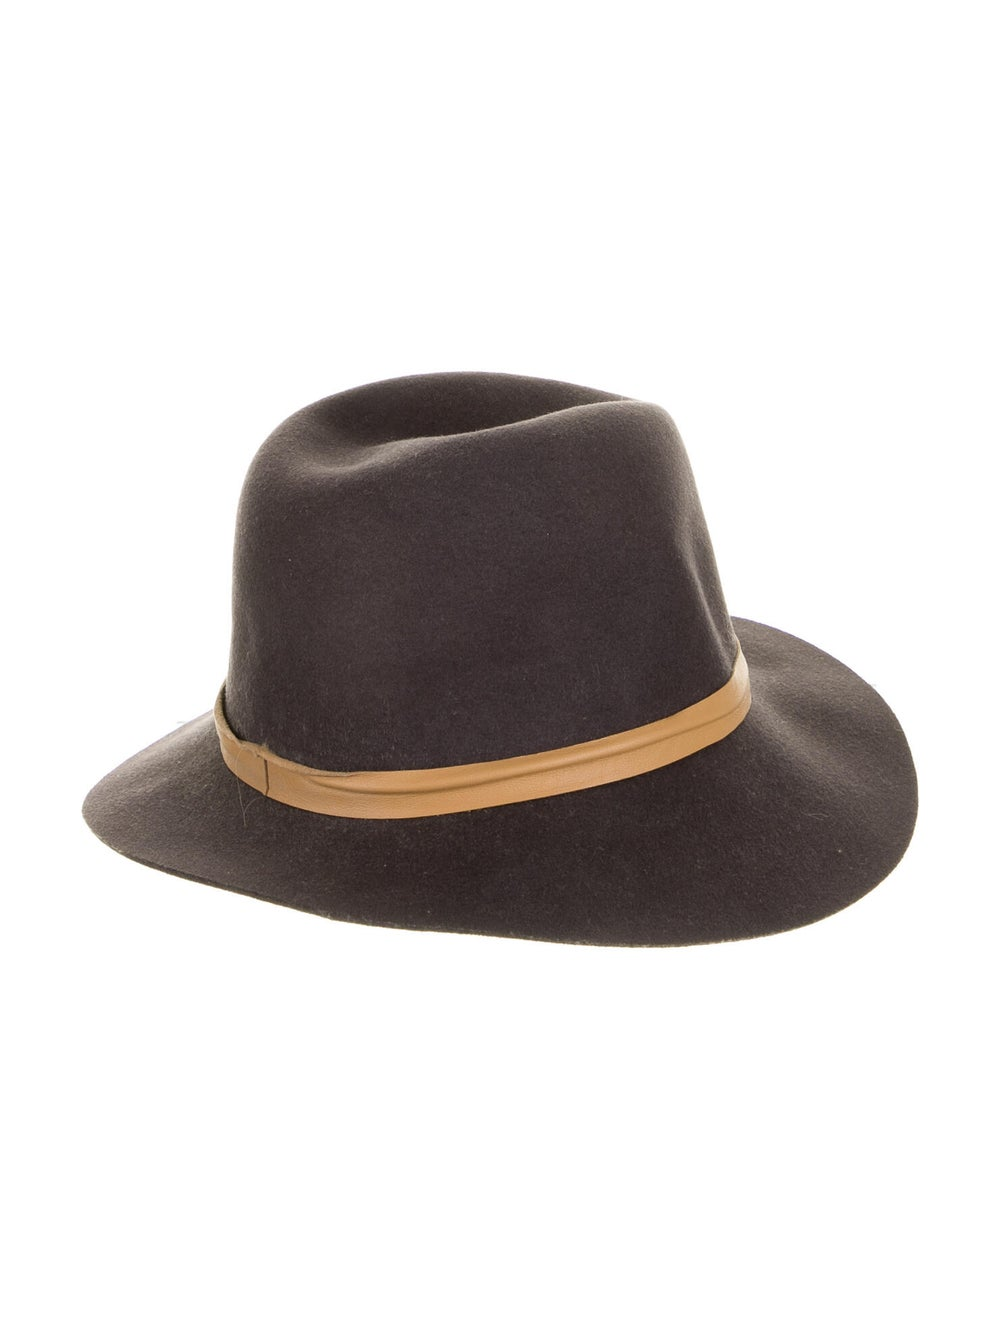 Janessa Leone Wool Fedora Hat brown - image 2